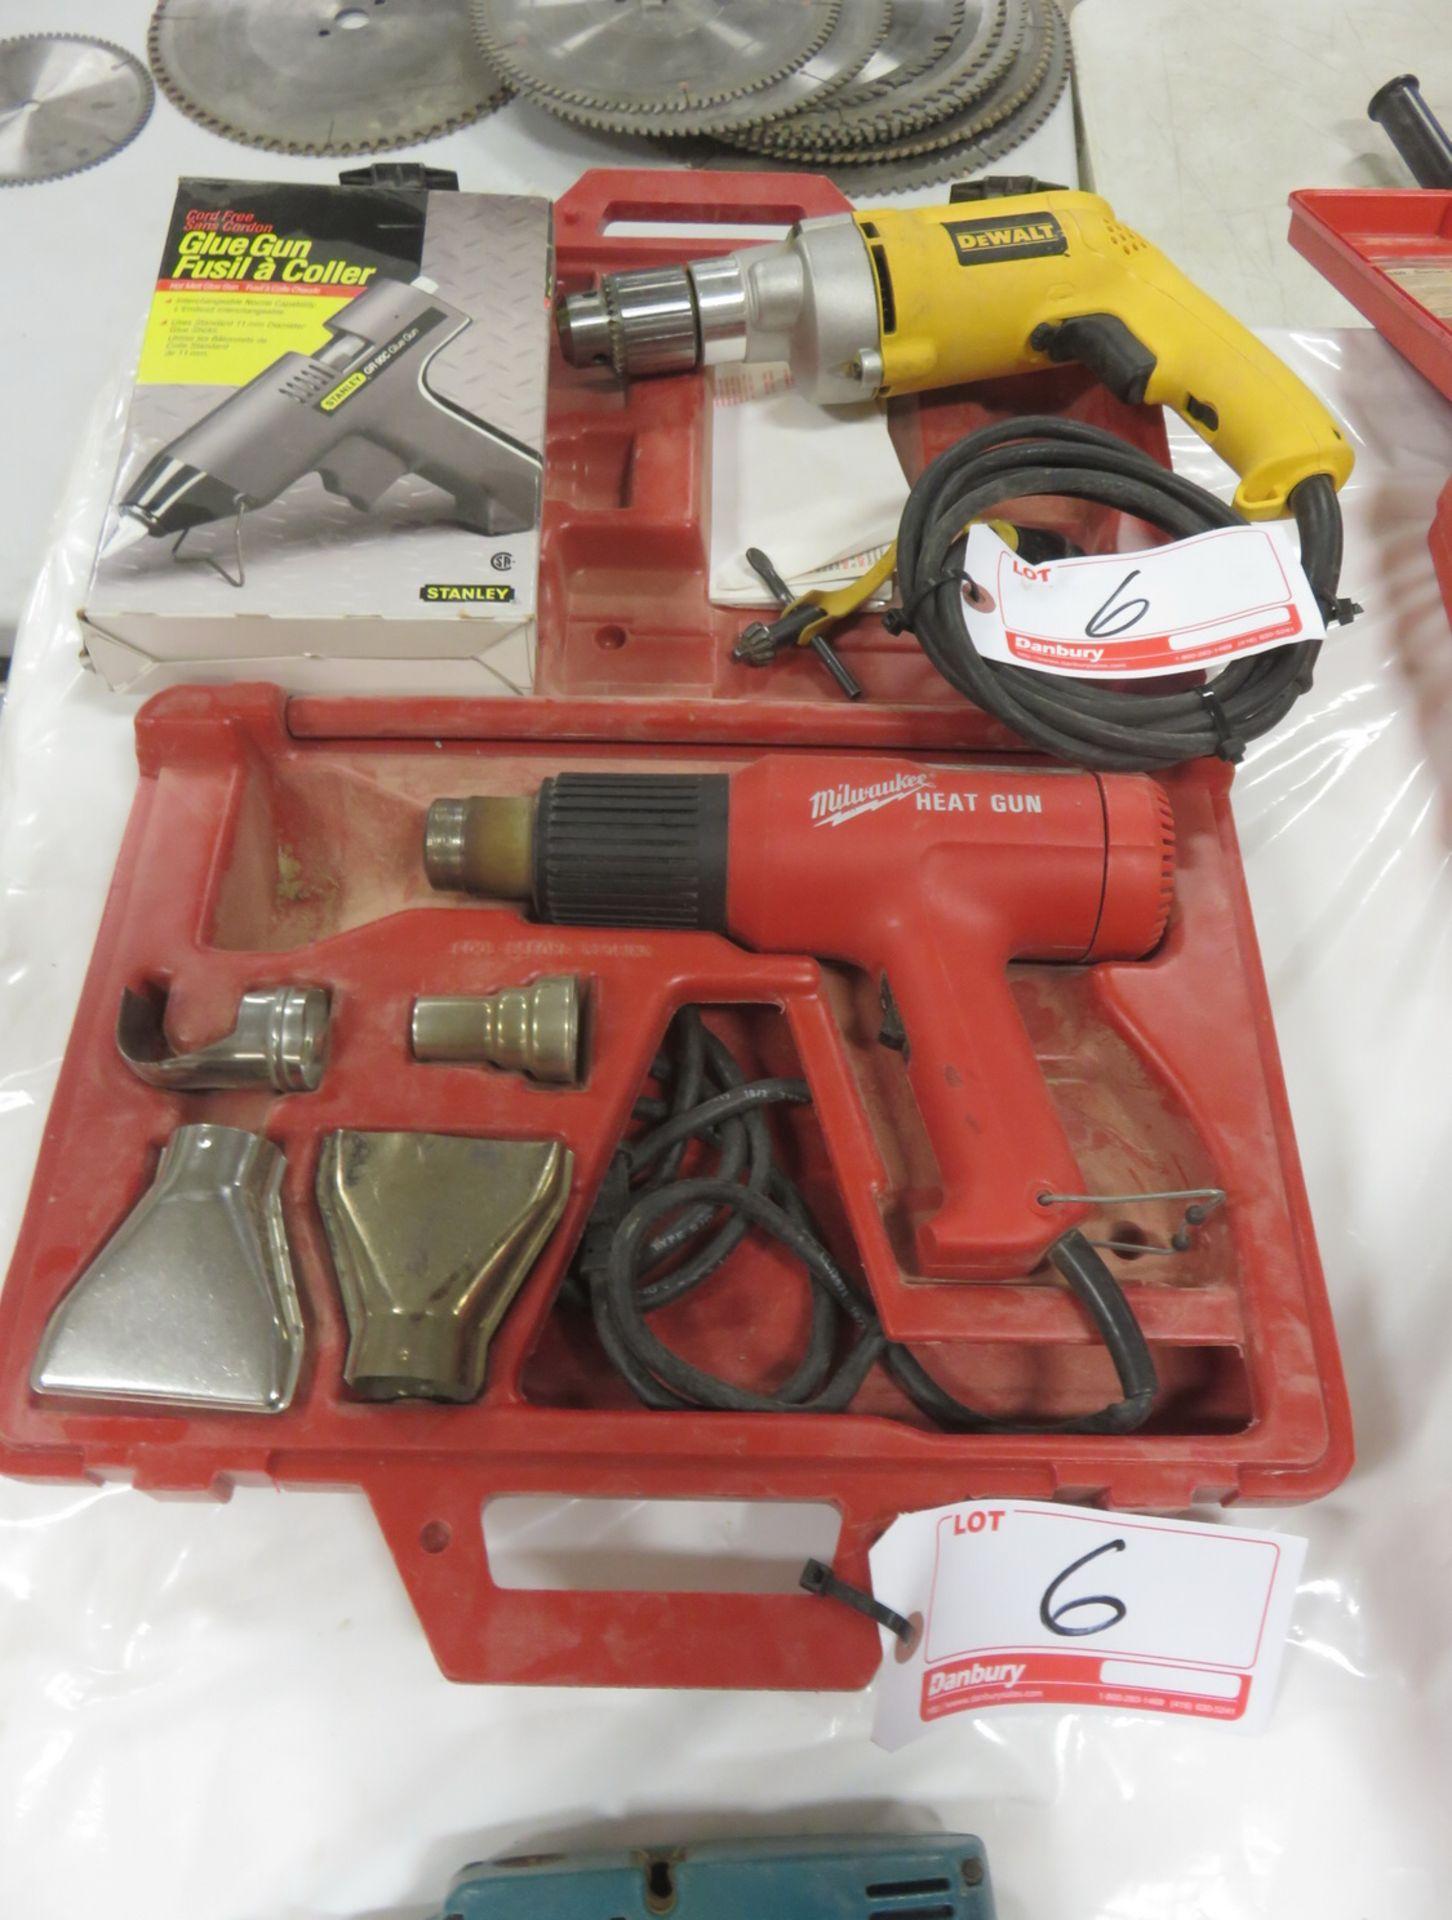 Lot 6 - LOT- DEWALT DW235G ELECTRIC 1/2 DRILL, MILWAUKEE HEAT GUN, STANLEY HOT GLUE GUN